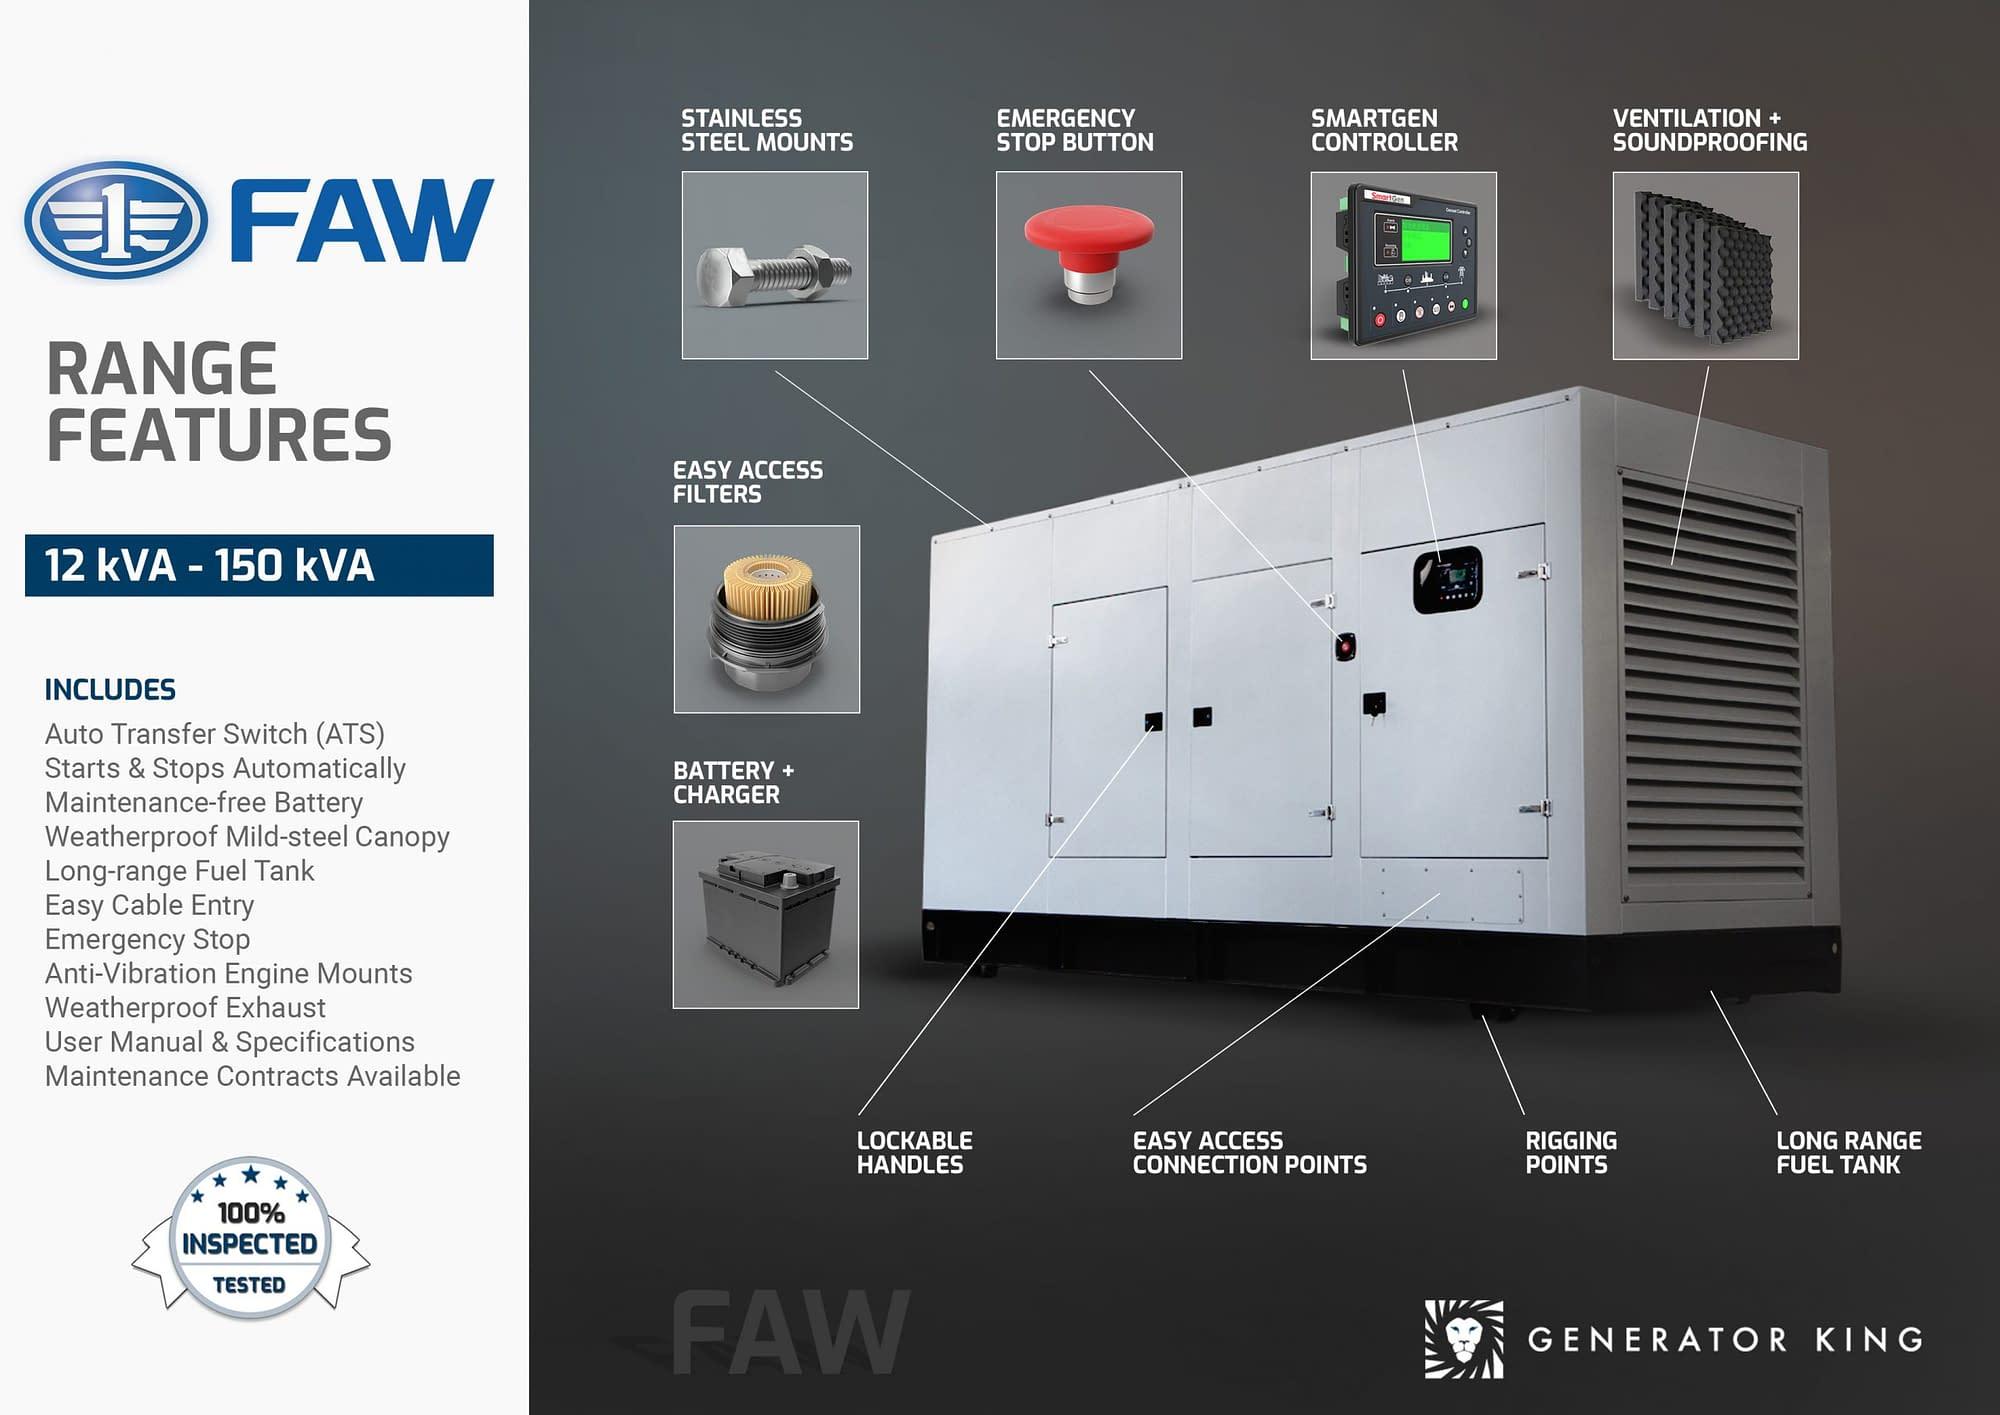 Diesel Generator for Sale | FAWDE Generators South Africa | Generator King